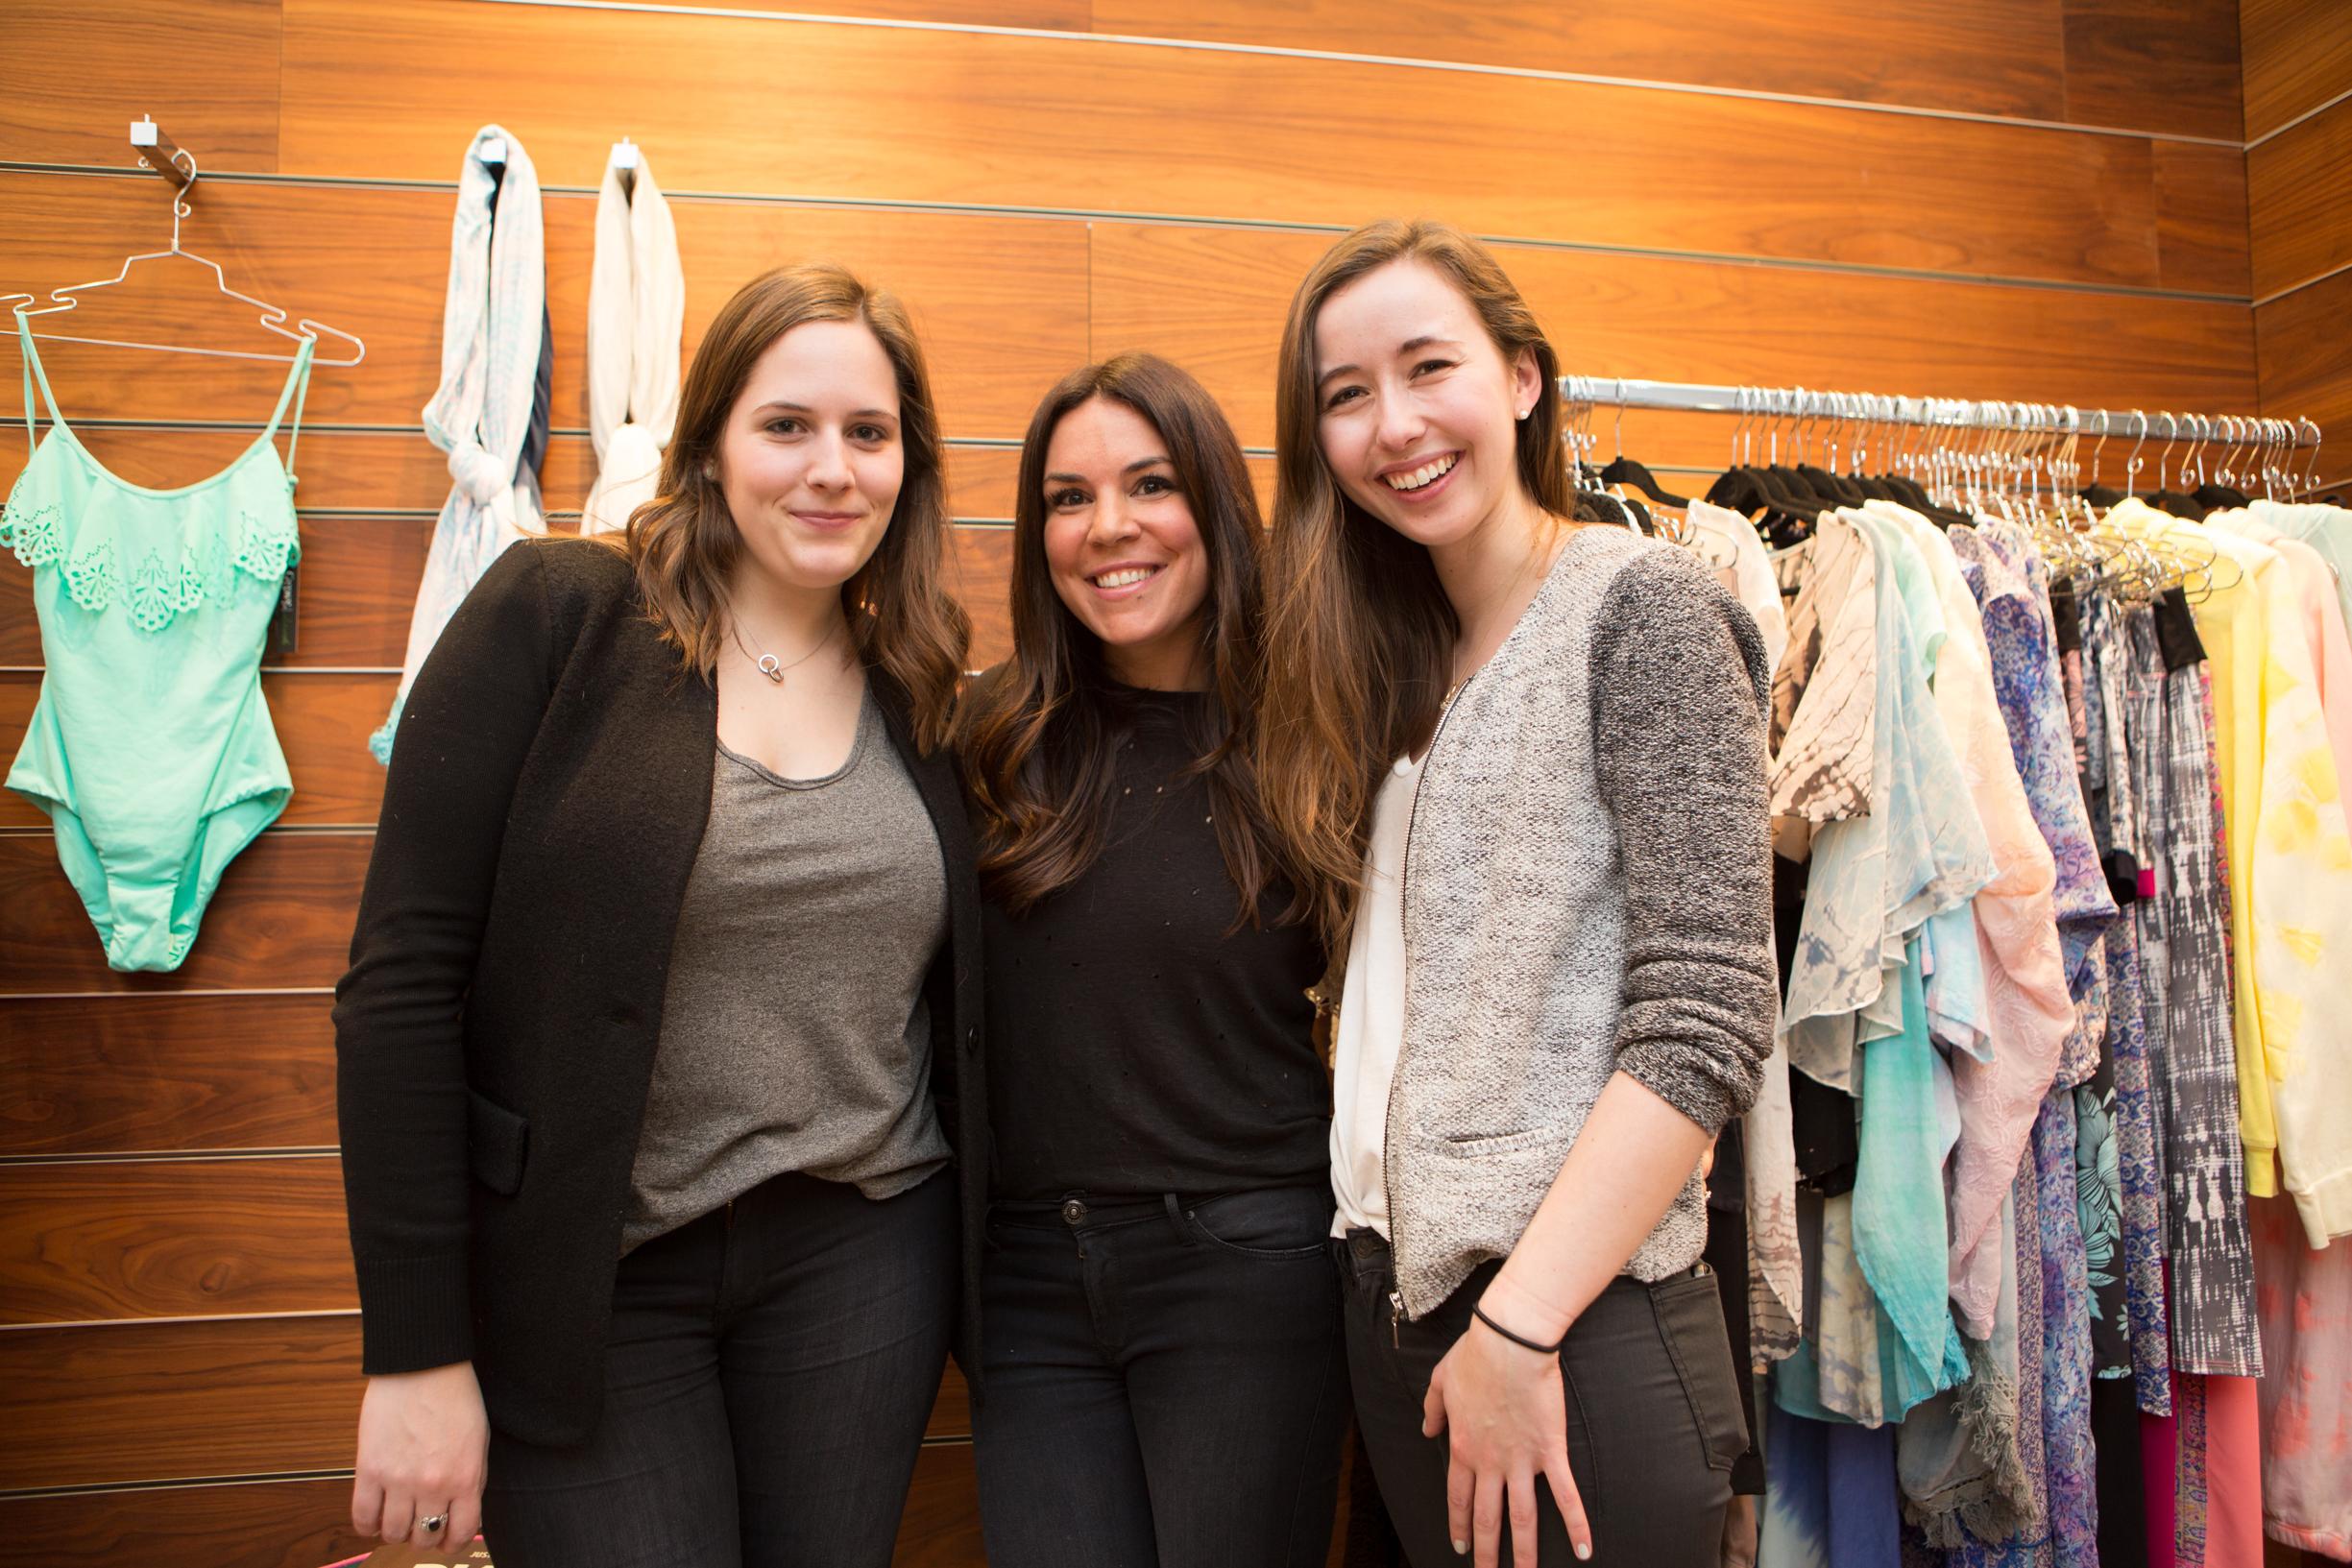 Sarrah sheiner show and tell fashion blog mademoiselle jules